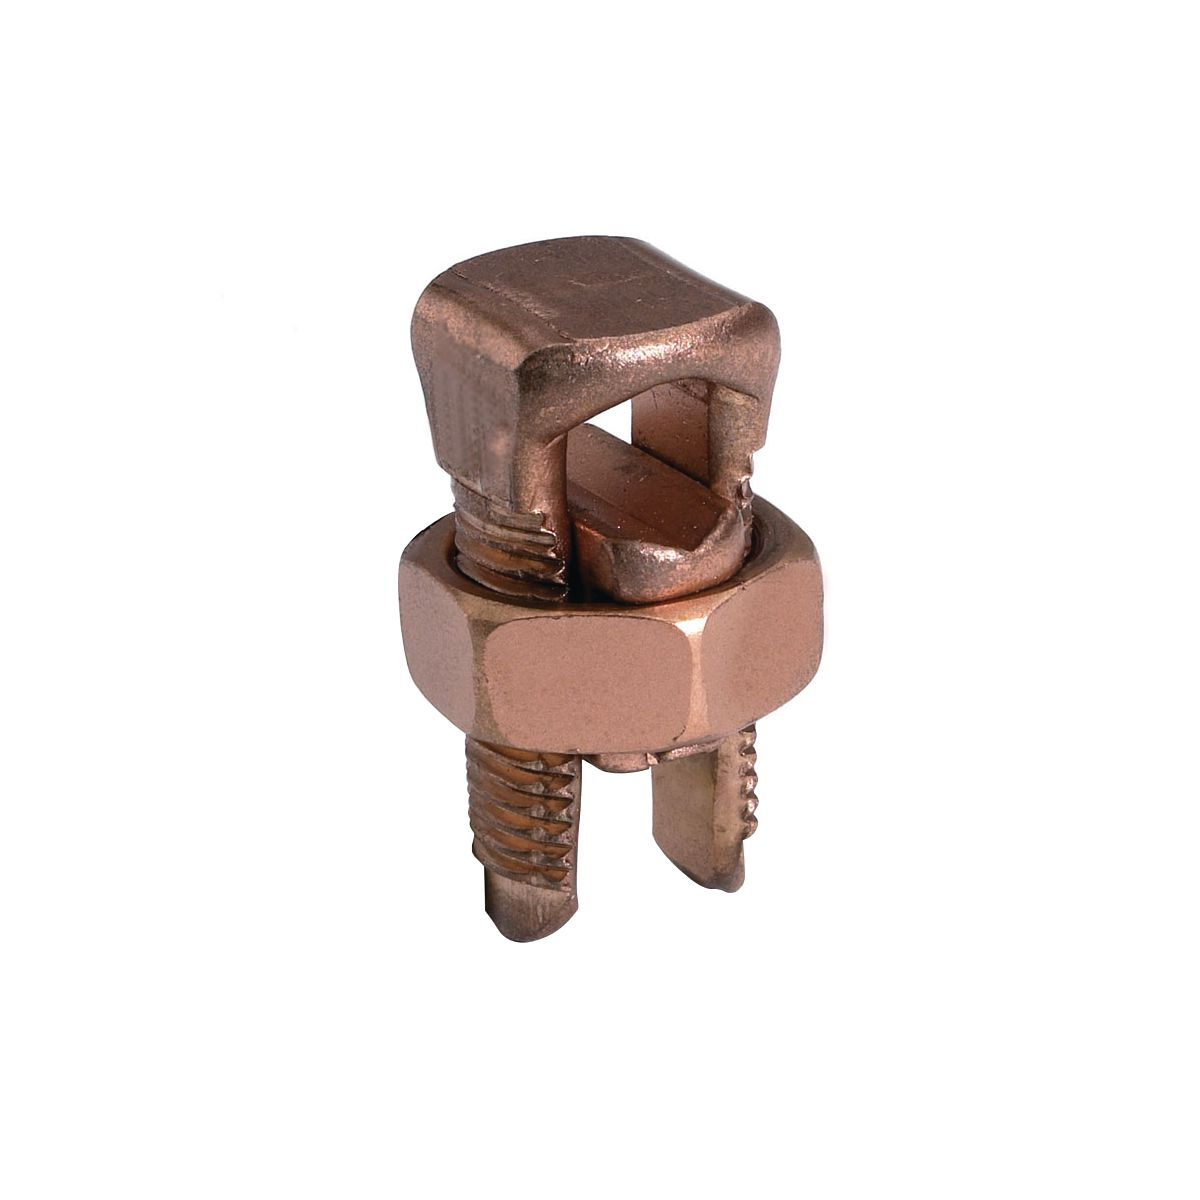 Burndy KS29 #1str-250 Copper Mechanical Split Bolt Connector